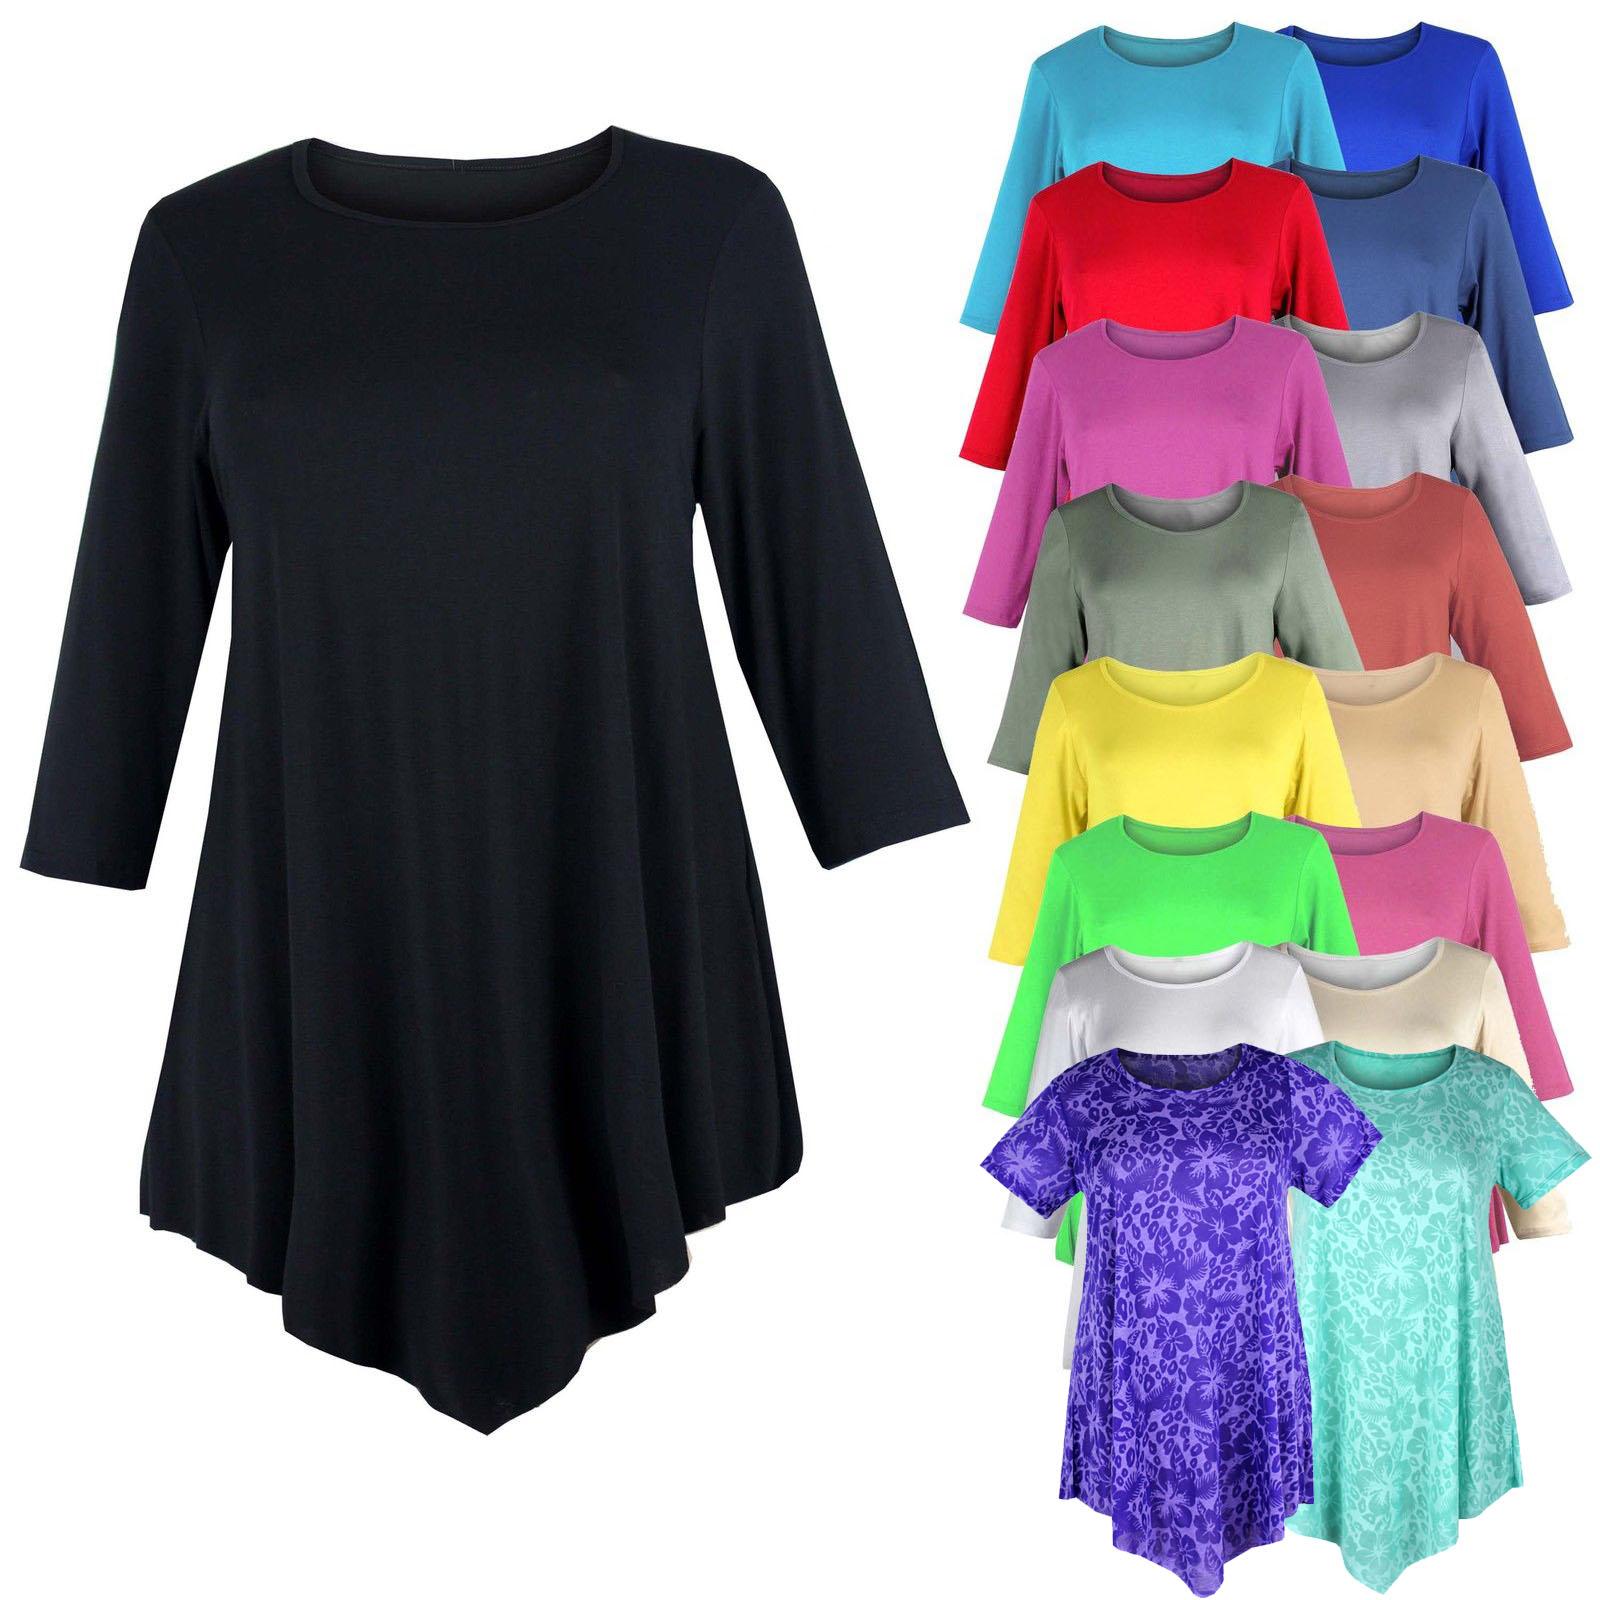 Ladies Womens Plus Size Three Quarter Sleeve Round Neck Tunic